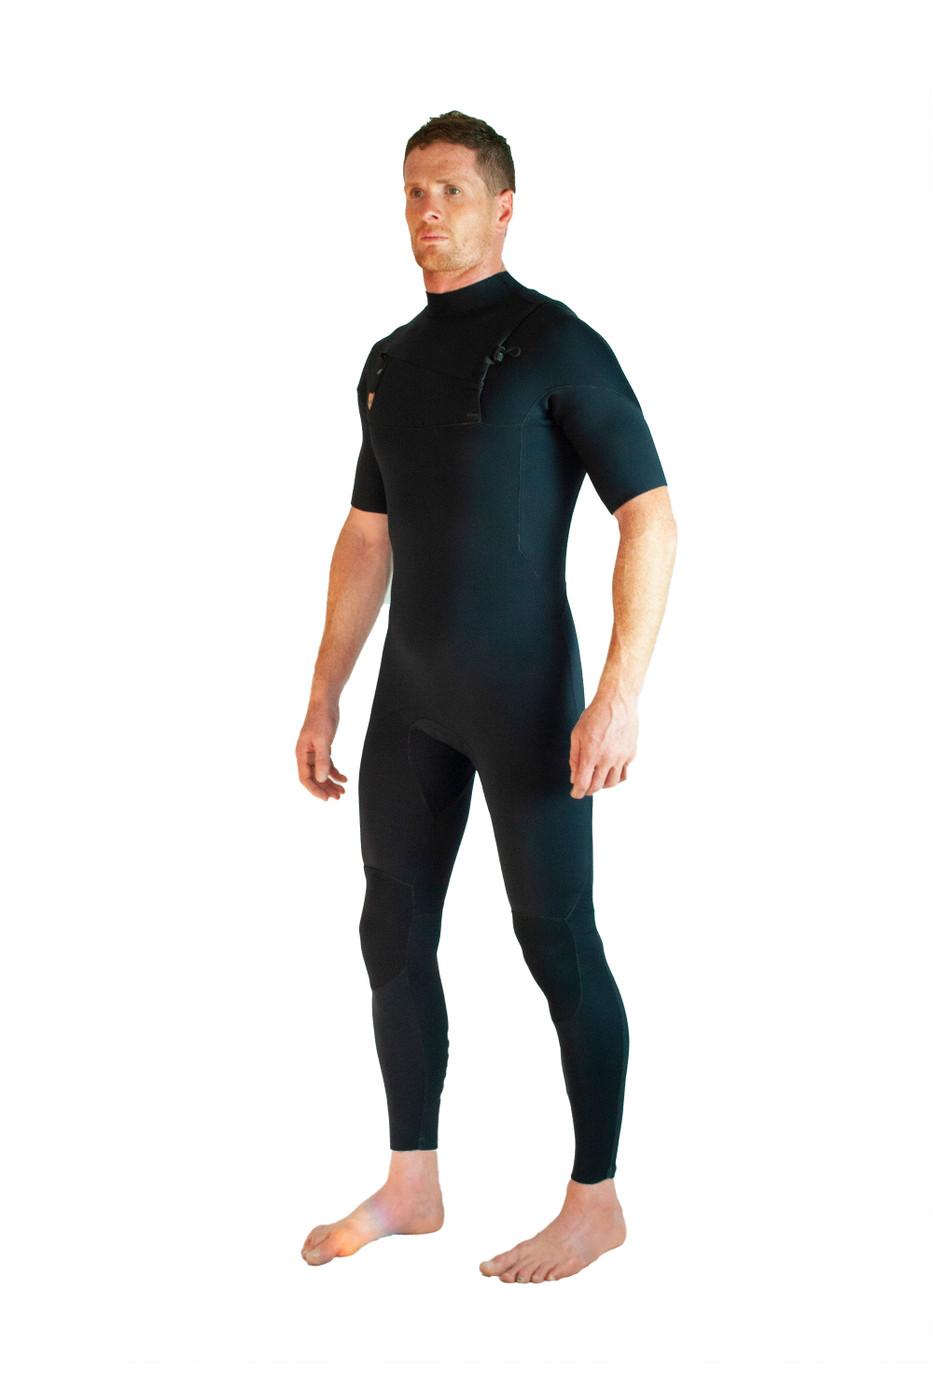 Lunasurf 2mm short arm summer wetsuit